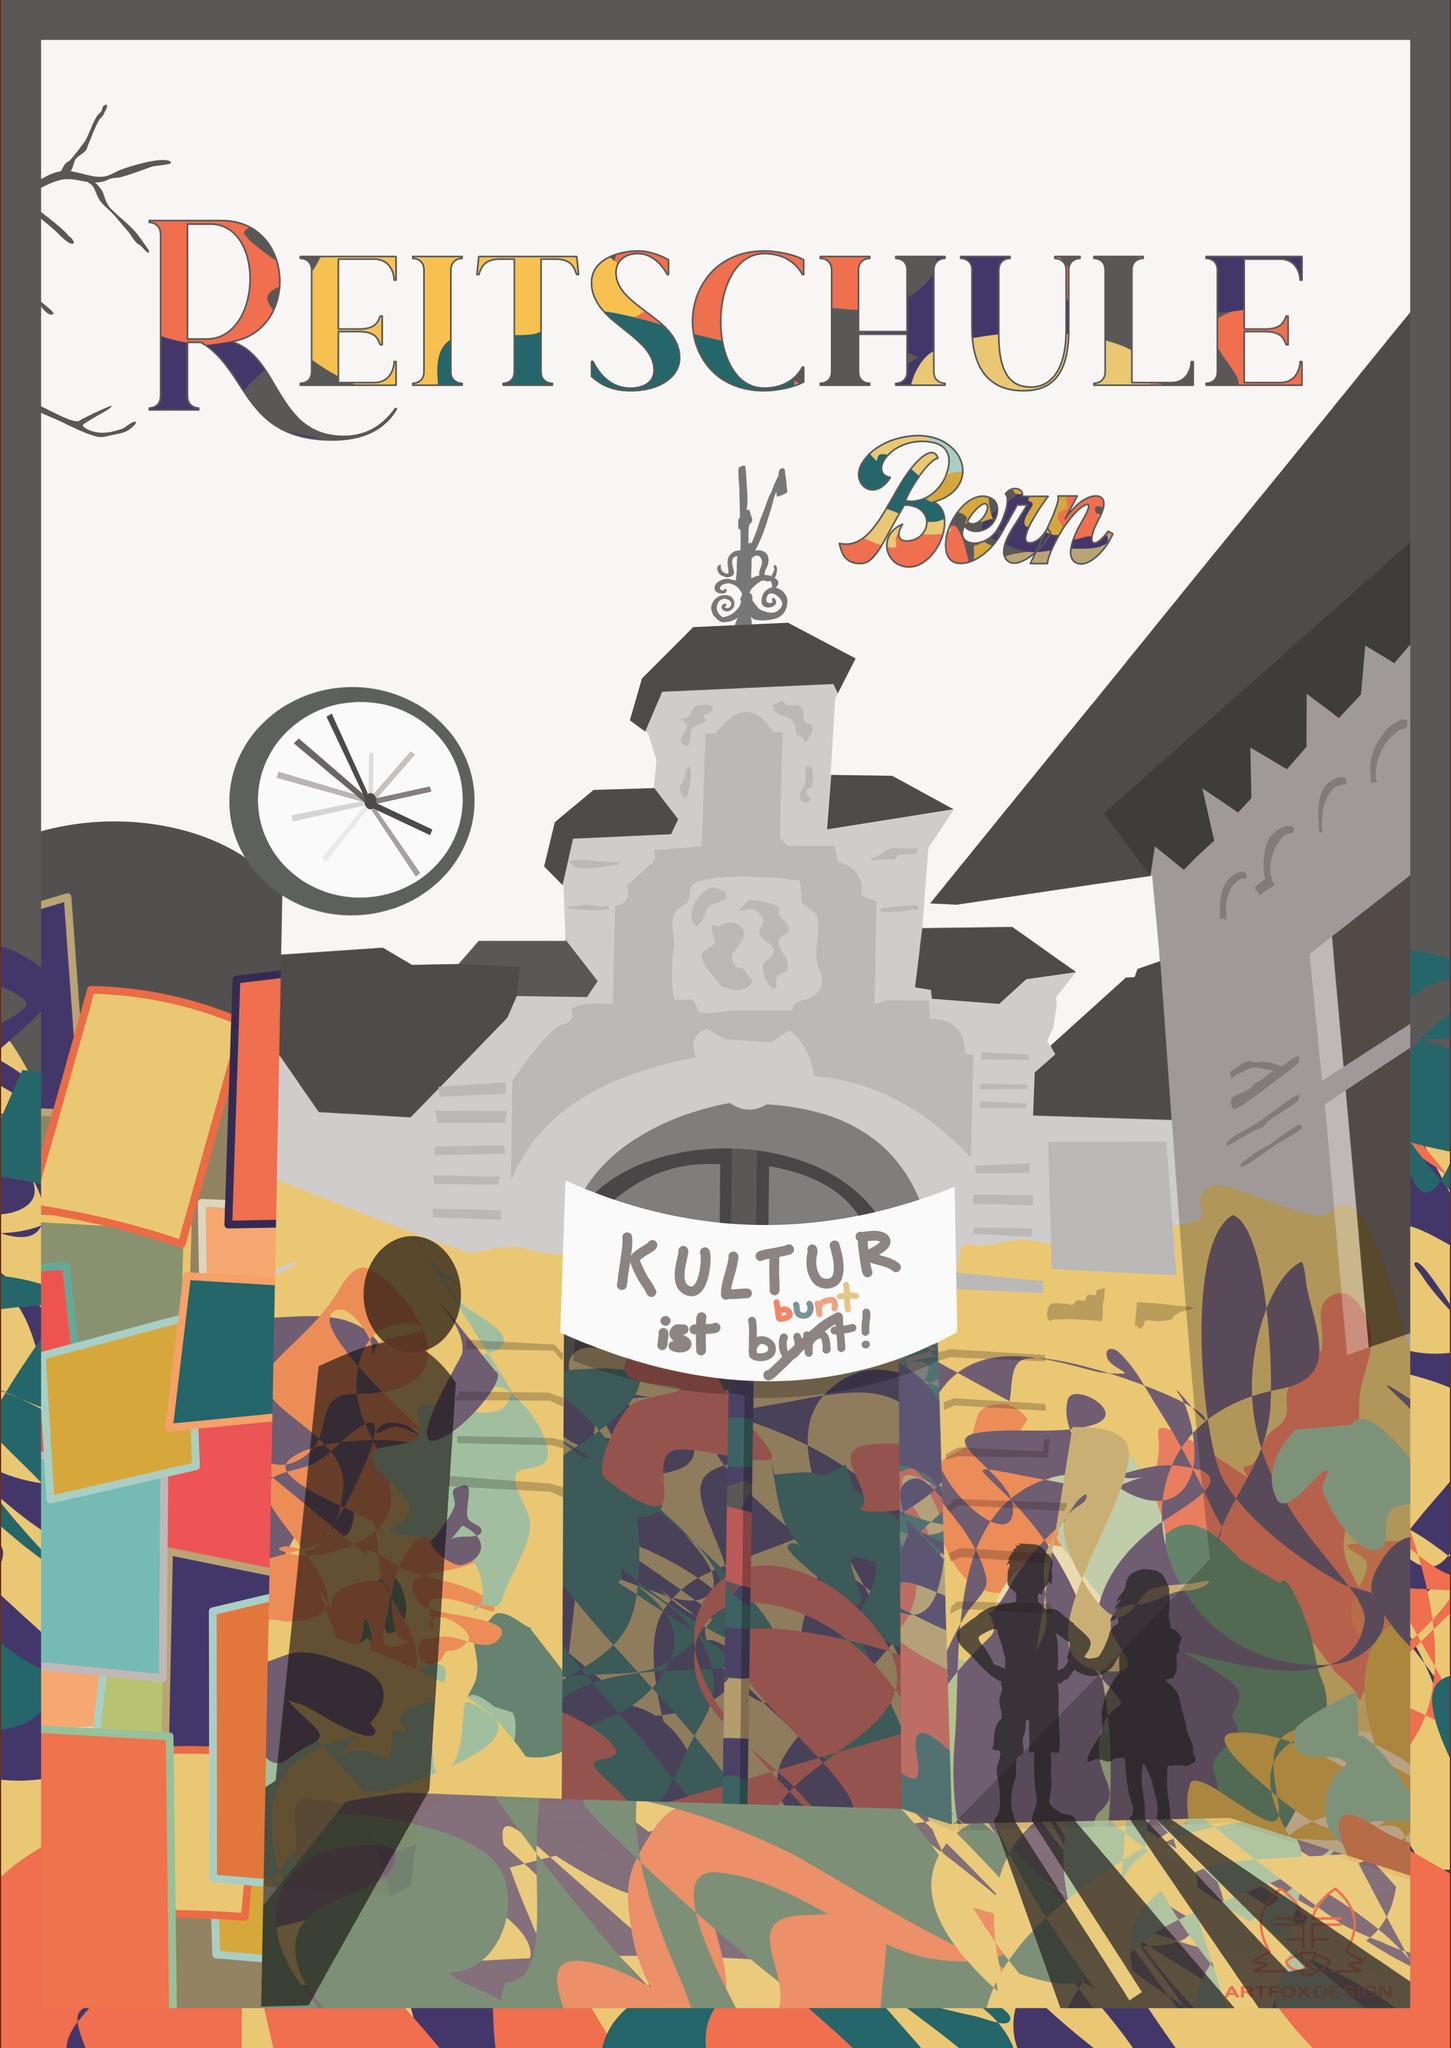 Reitschule